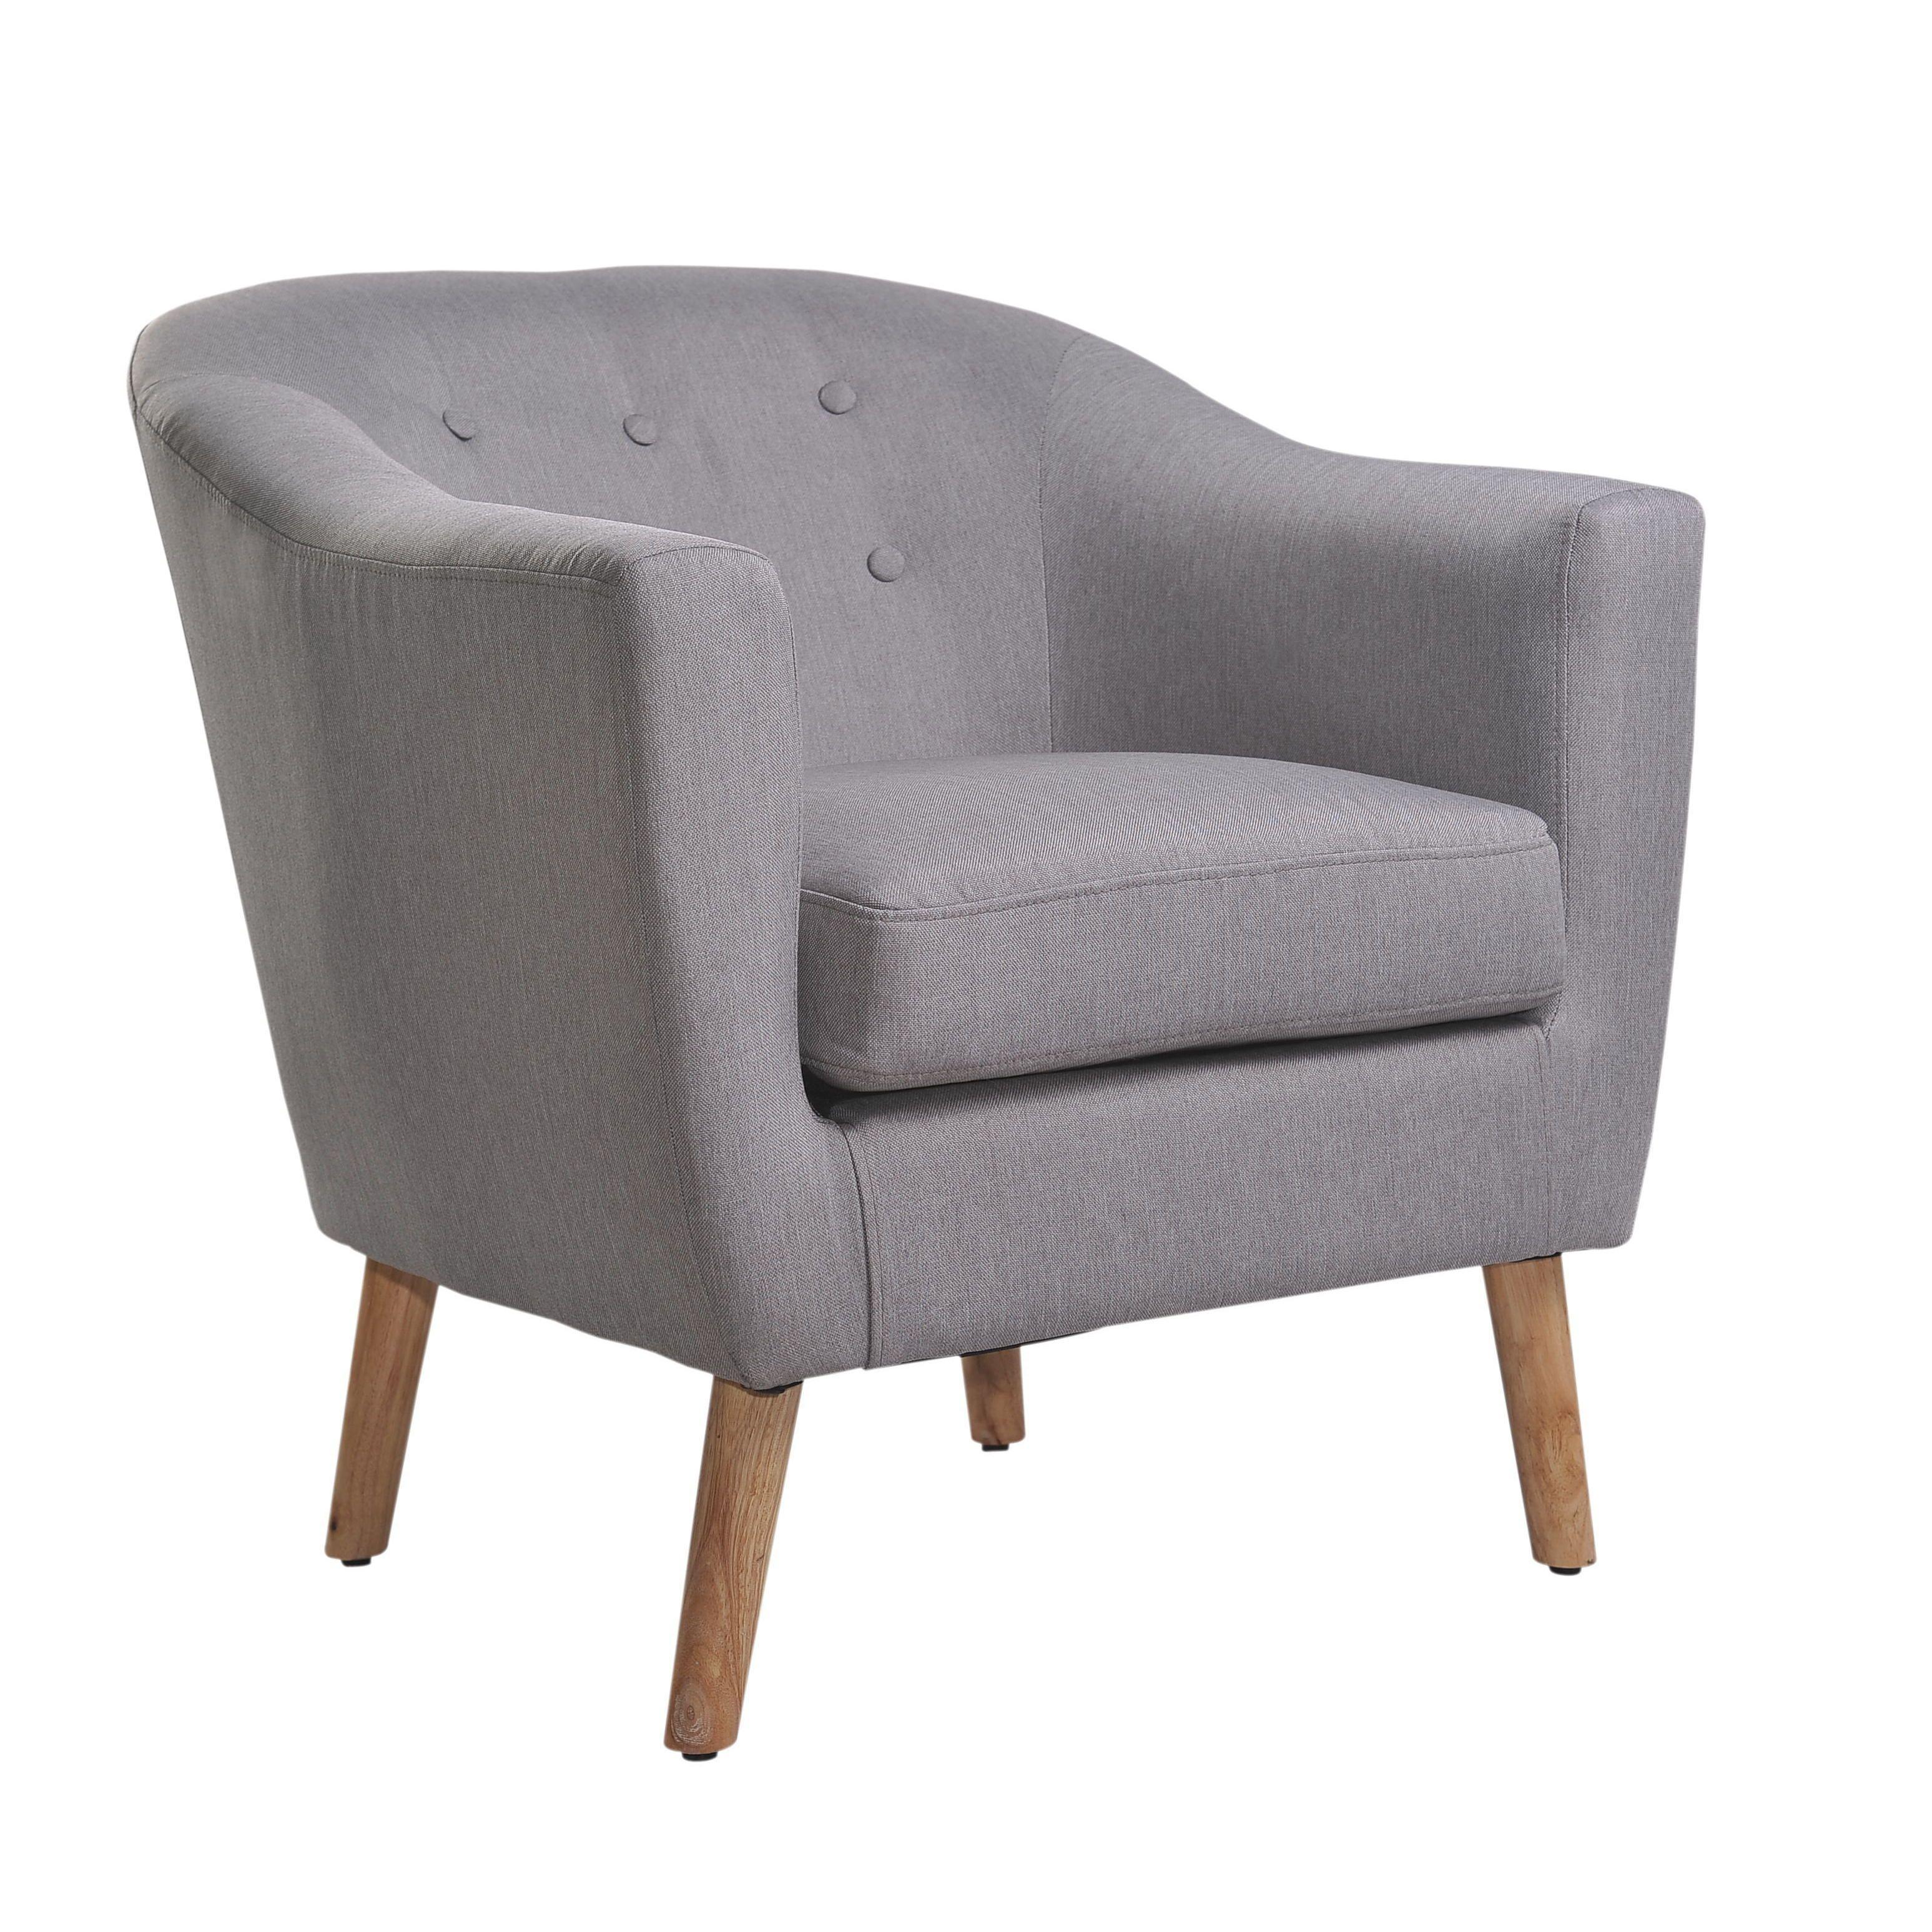 Overstuffed Living Room Chairs Nathaniel Home Jason Mid Century Light Grey Club Chair Hem